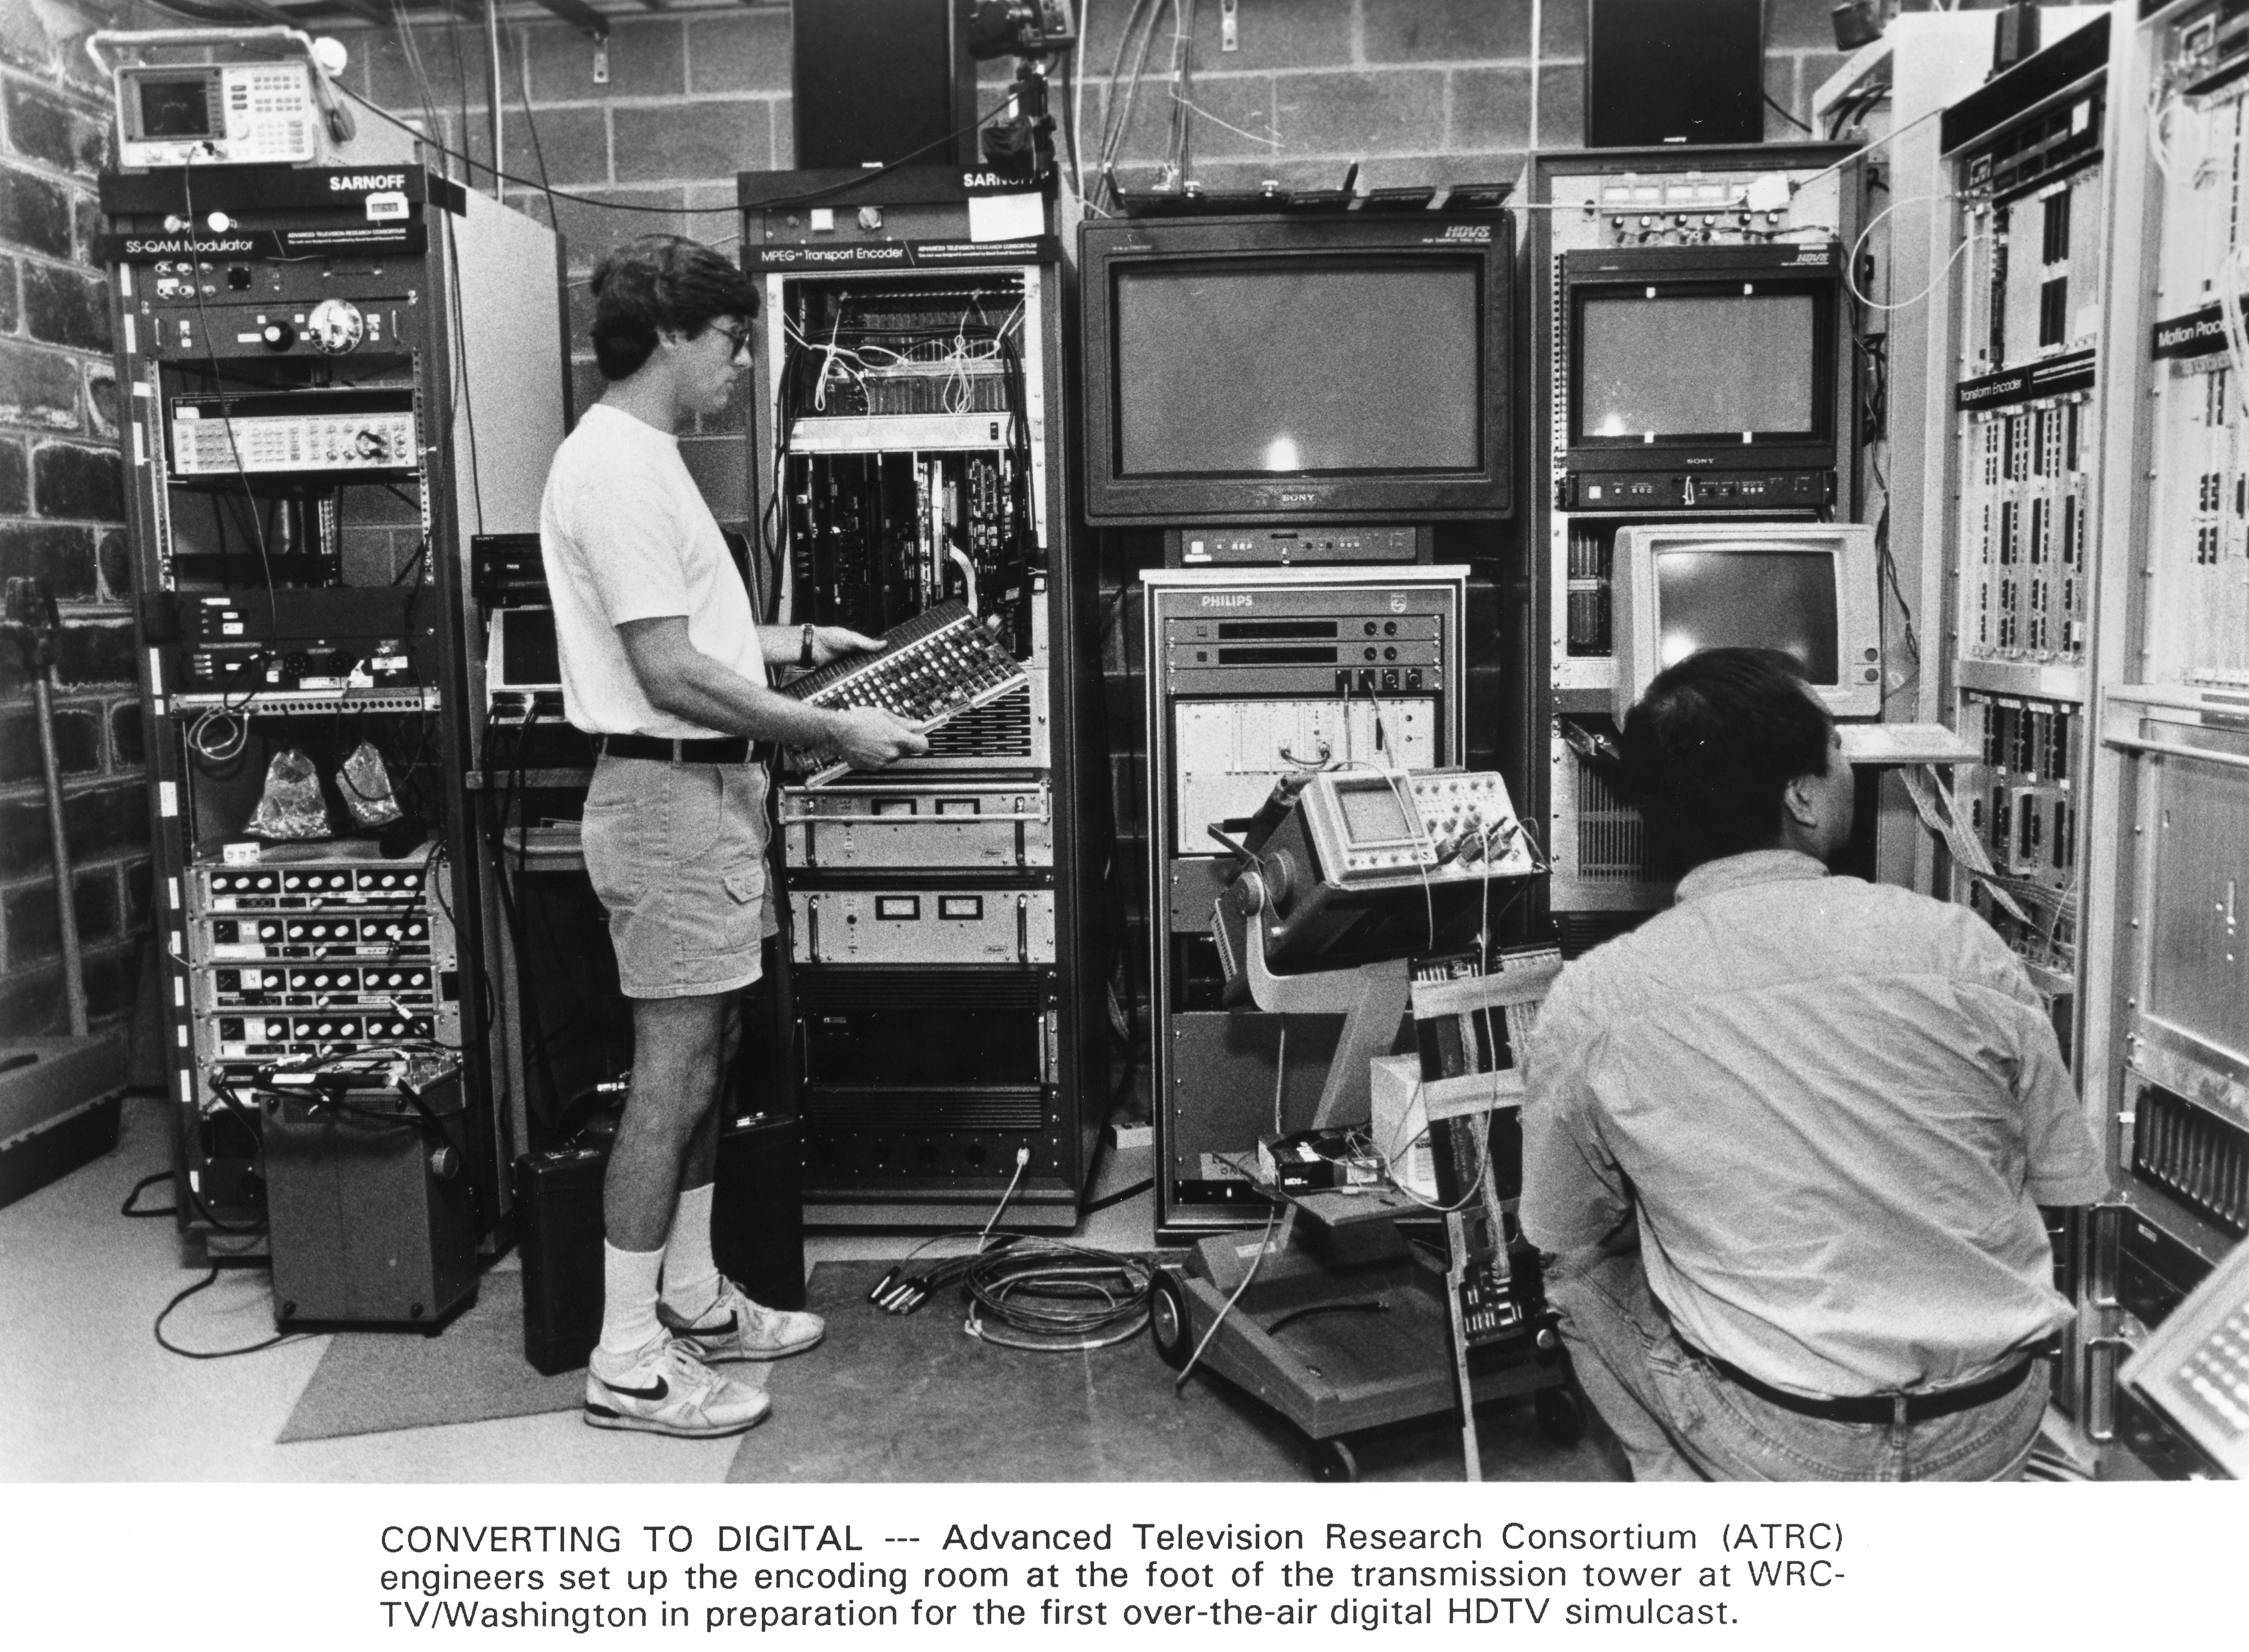 1992-09-30 AD-HDTV first digital simulcast